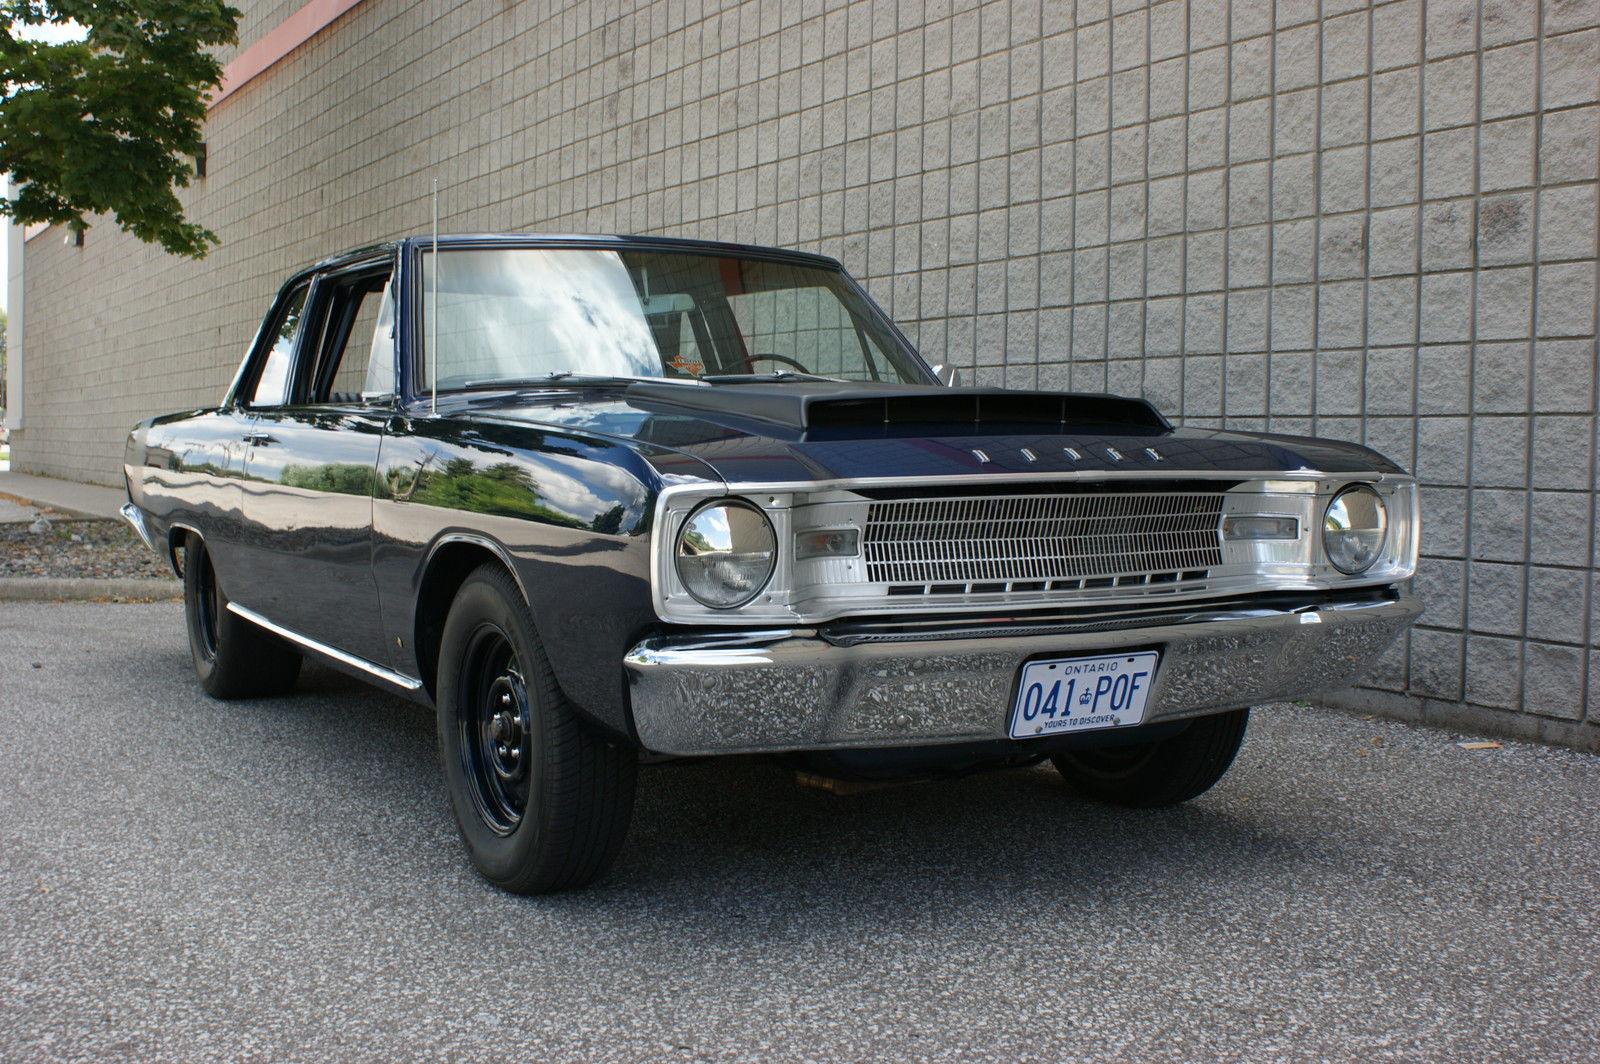 BangShiftcom This 1967 Dodge Dart Sedan Is One Tough Looking